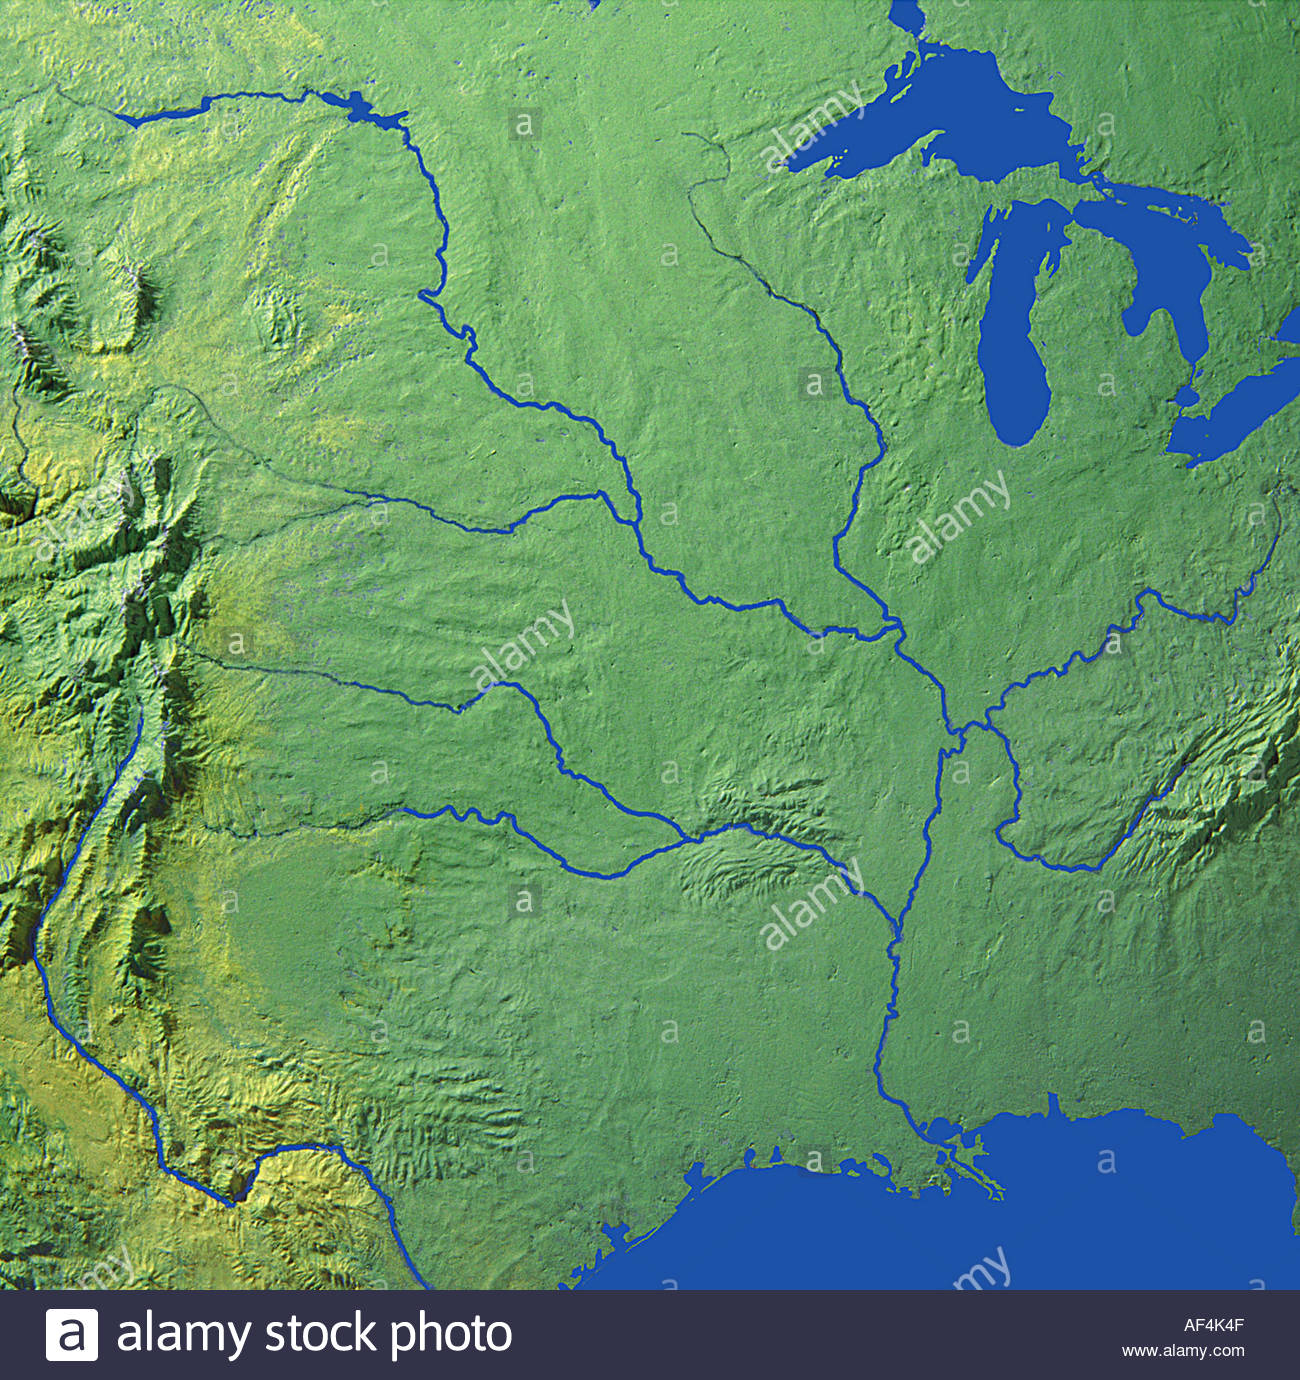 map maps globe globes North America USA South East Stock ...